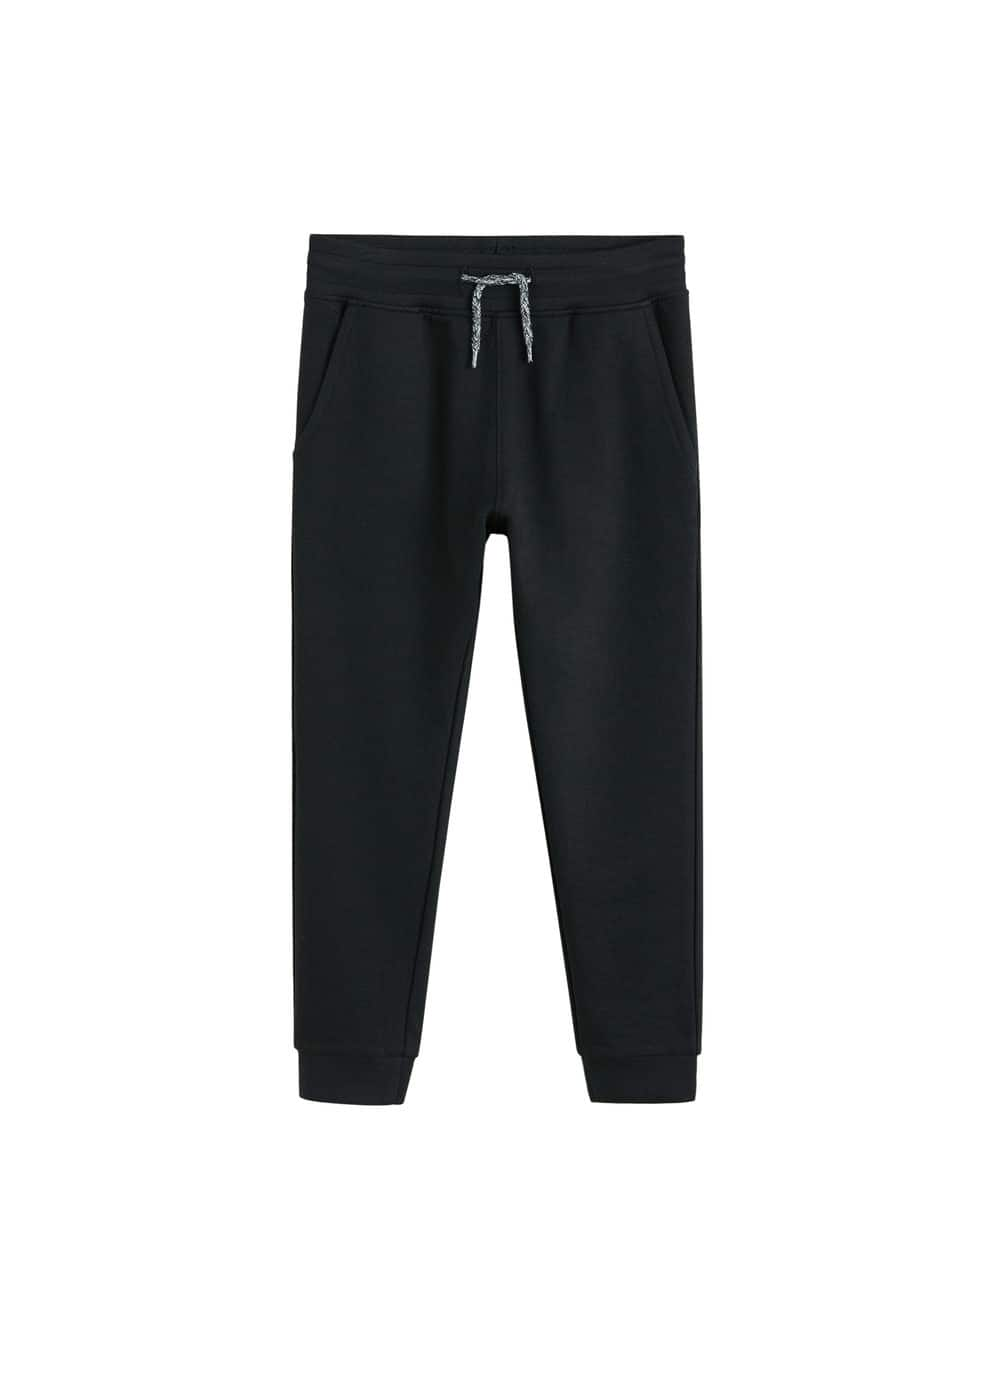 o-franciap:pantalon jogging algodon